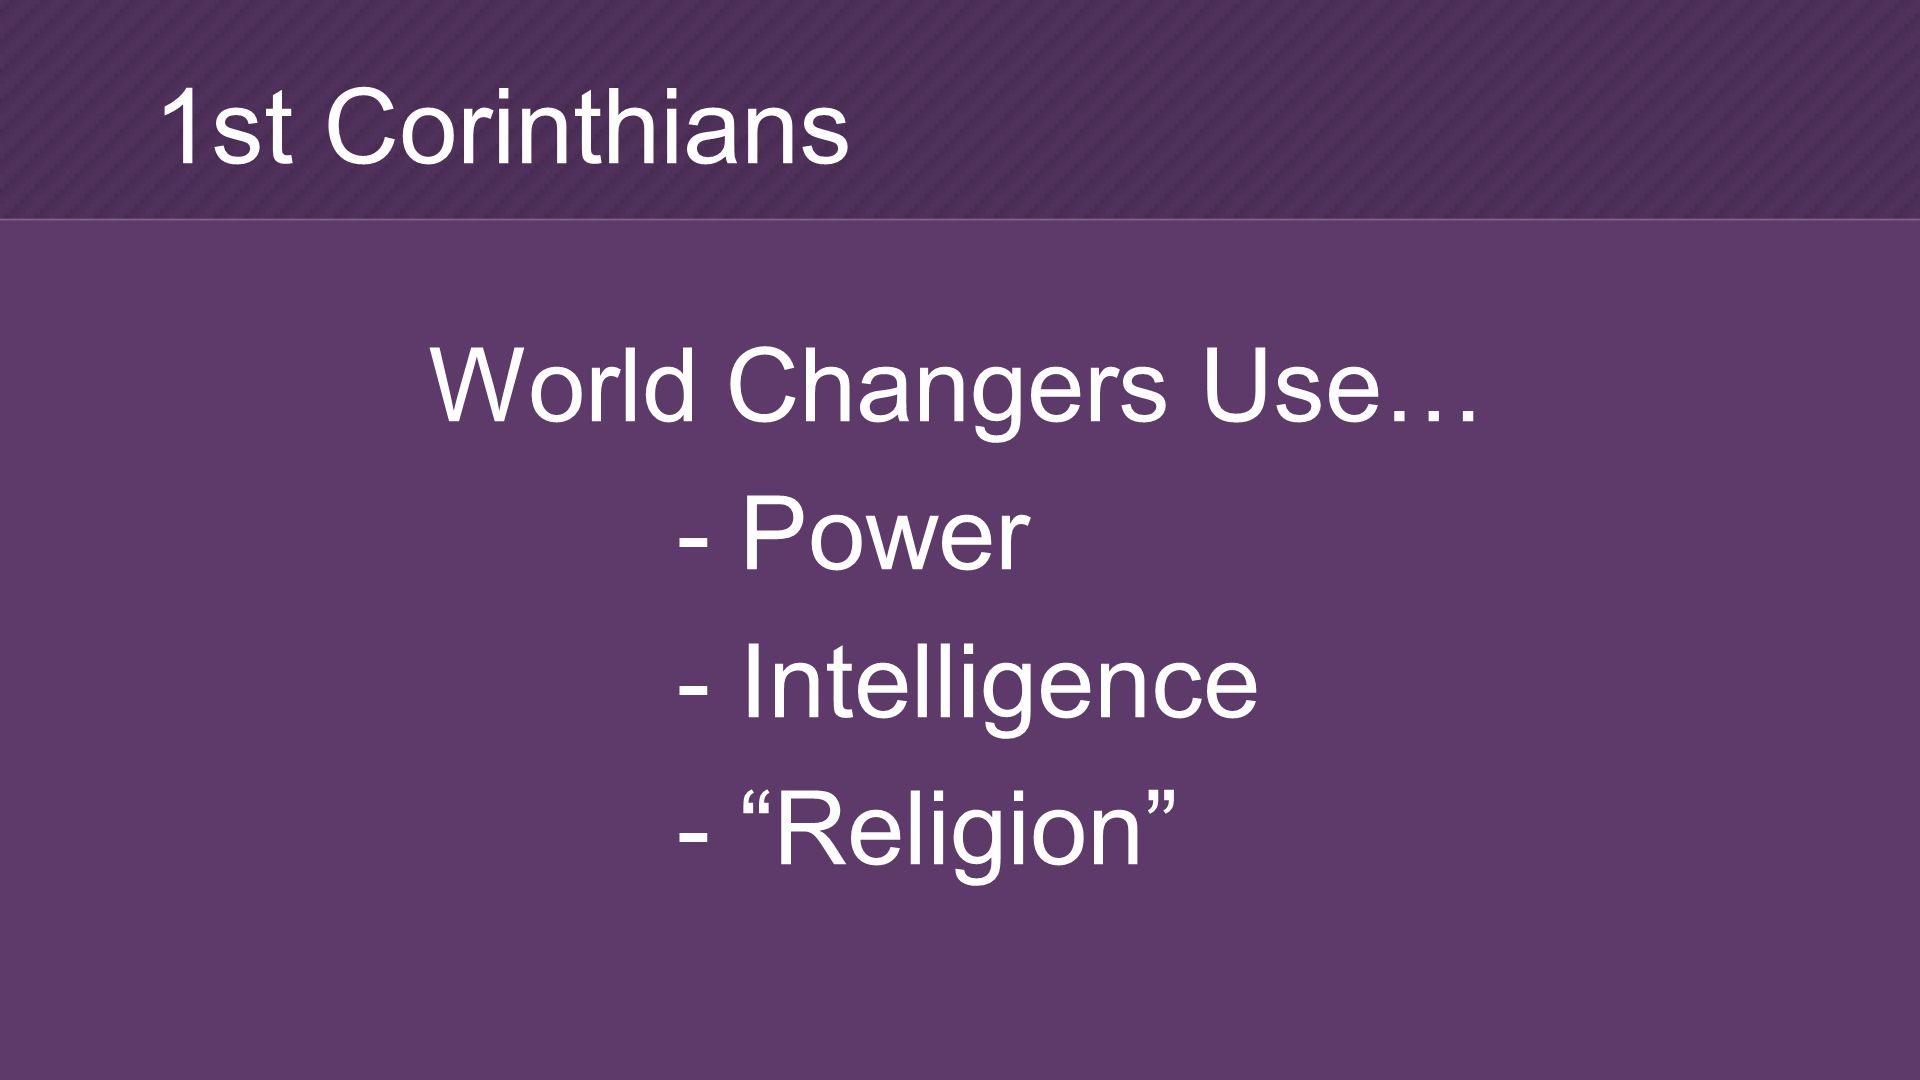 World Changers Use… - Power - Intelligence - Religion 1st Corinthians